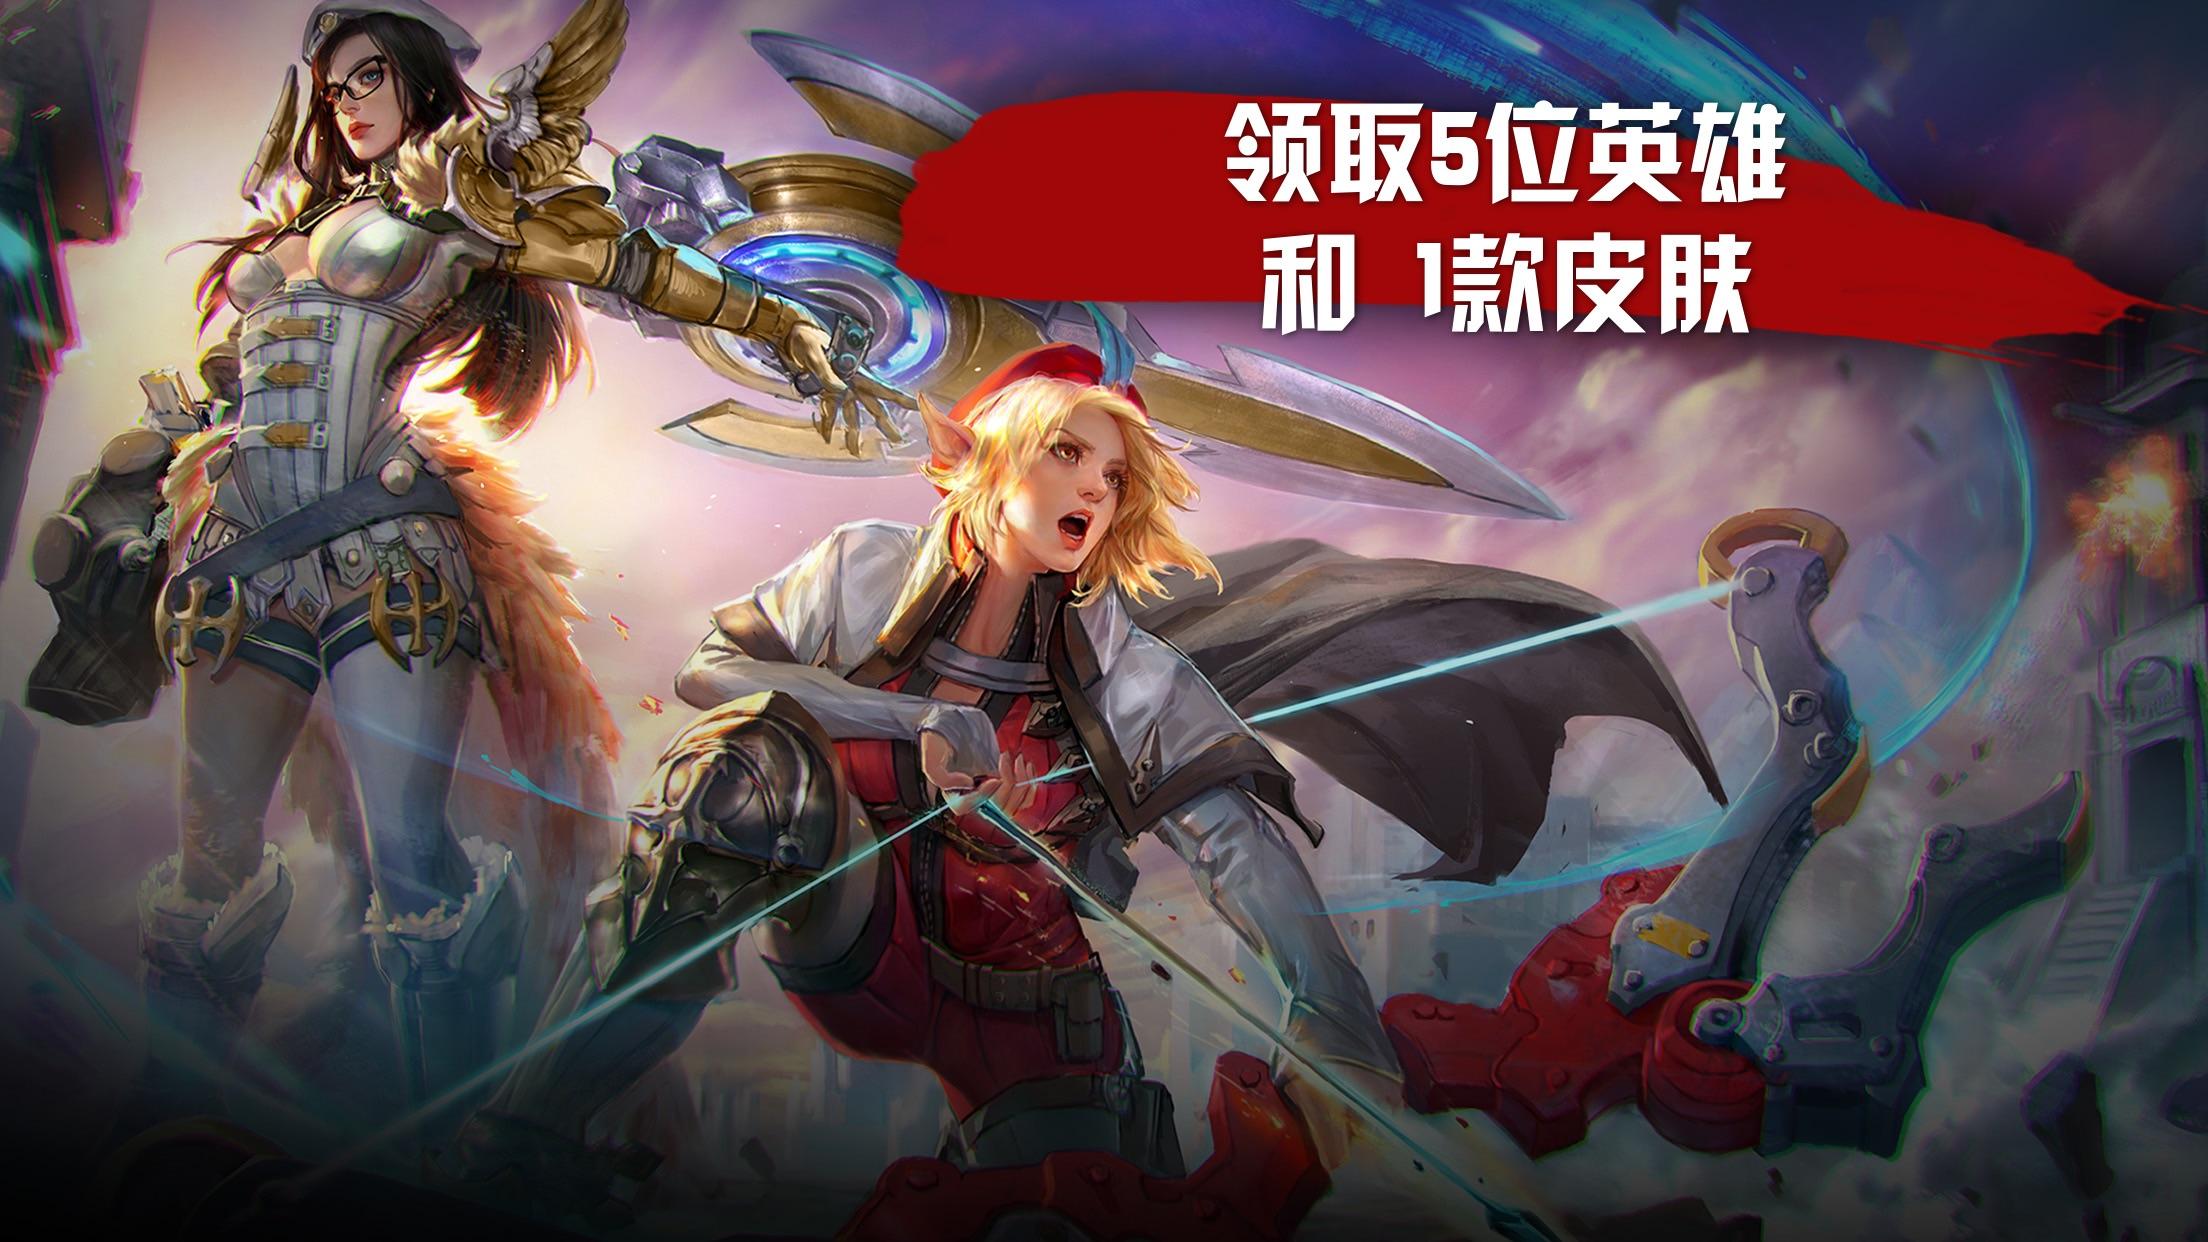 虚荣 (Vainglory) Screenshot